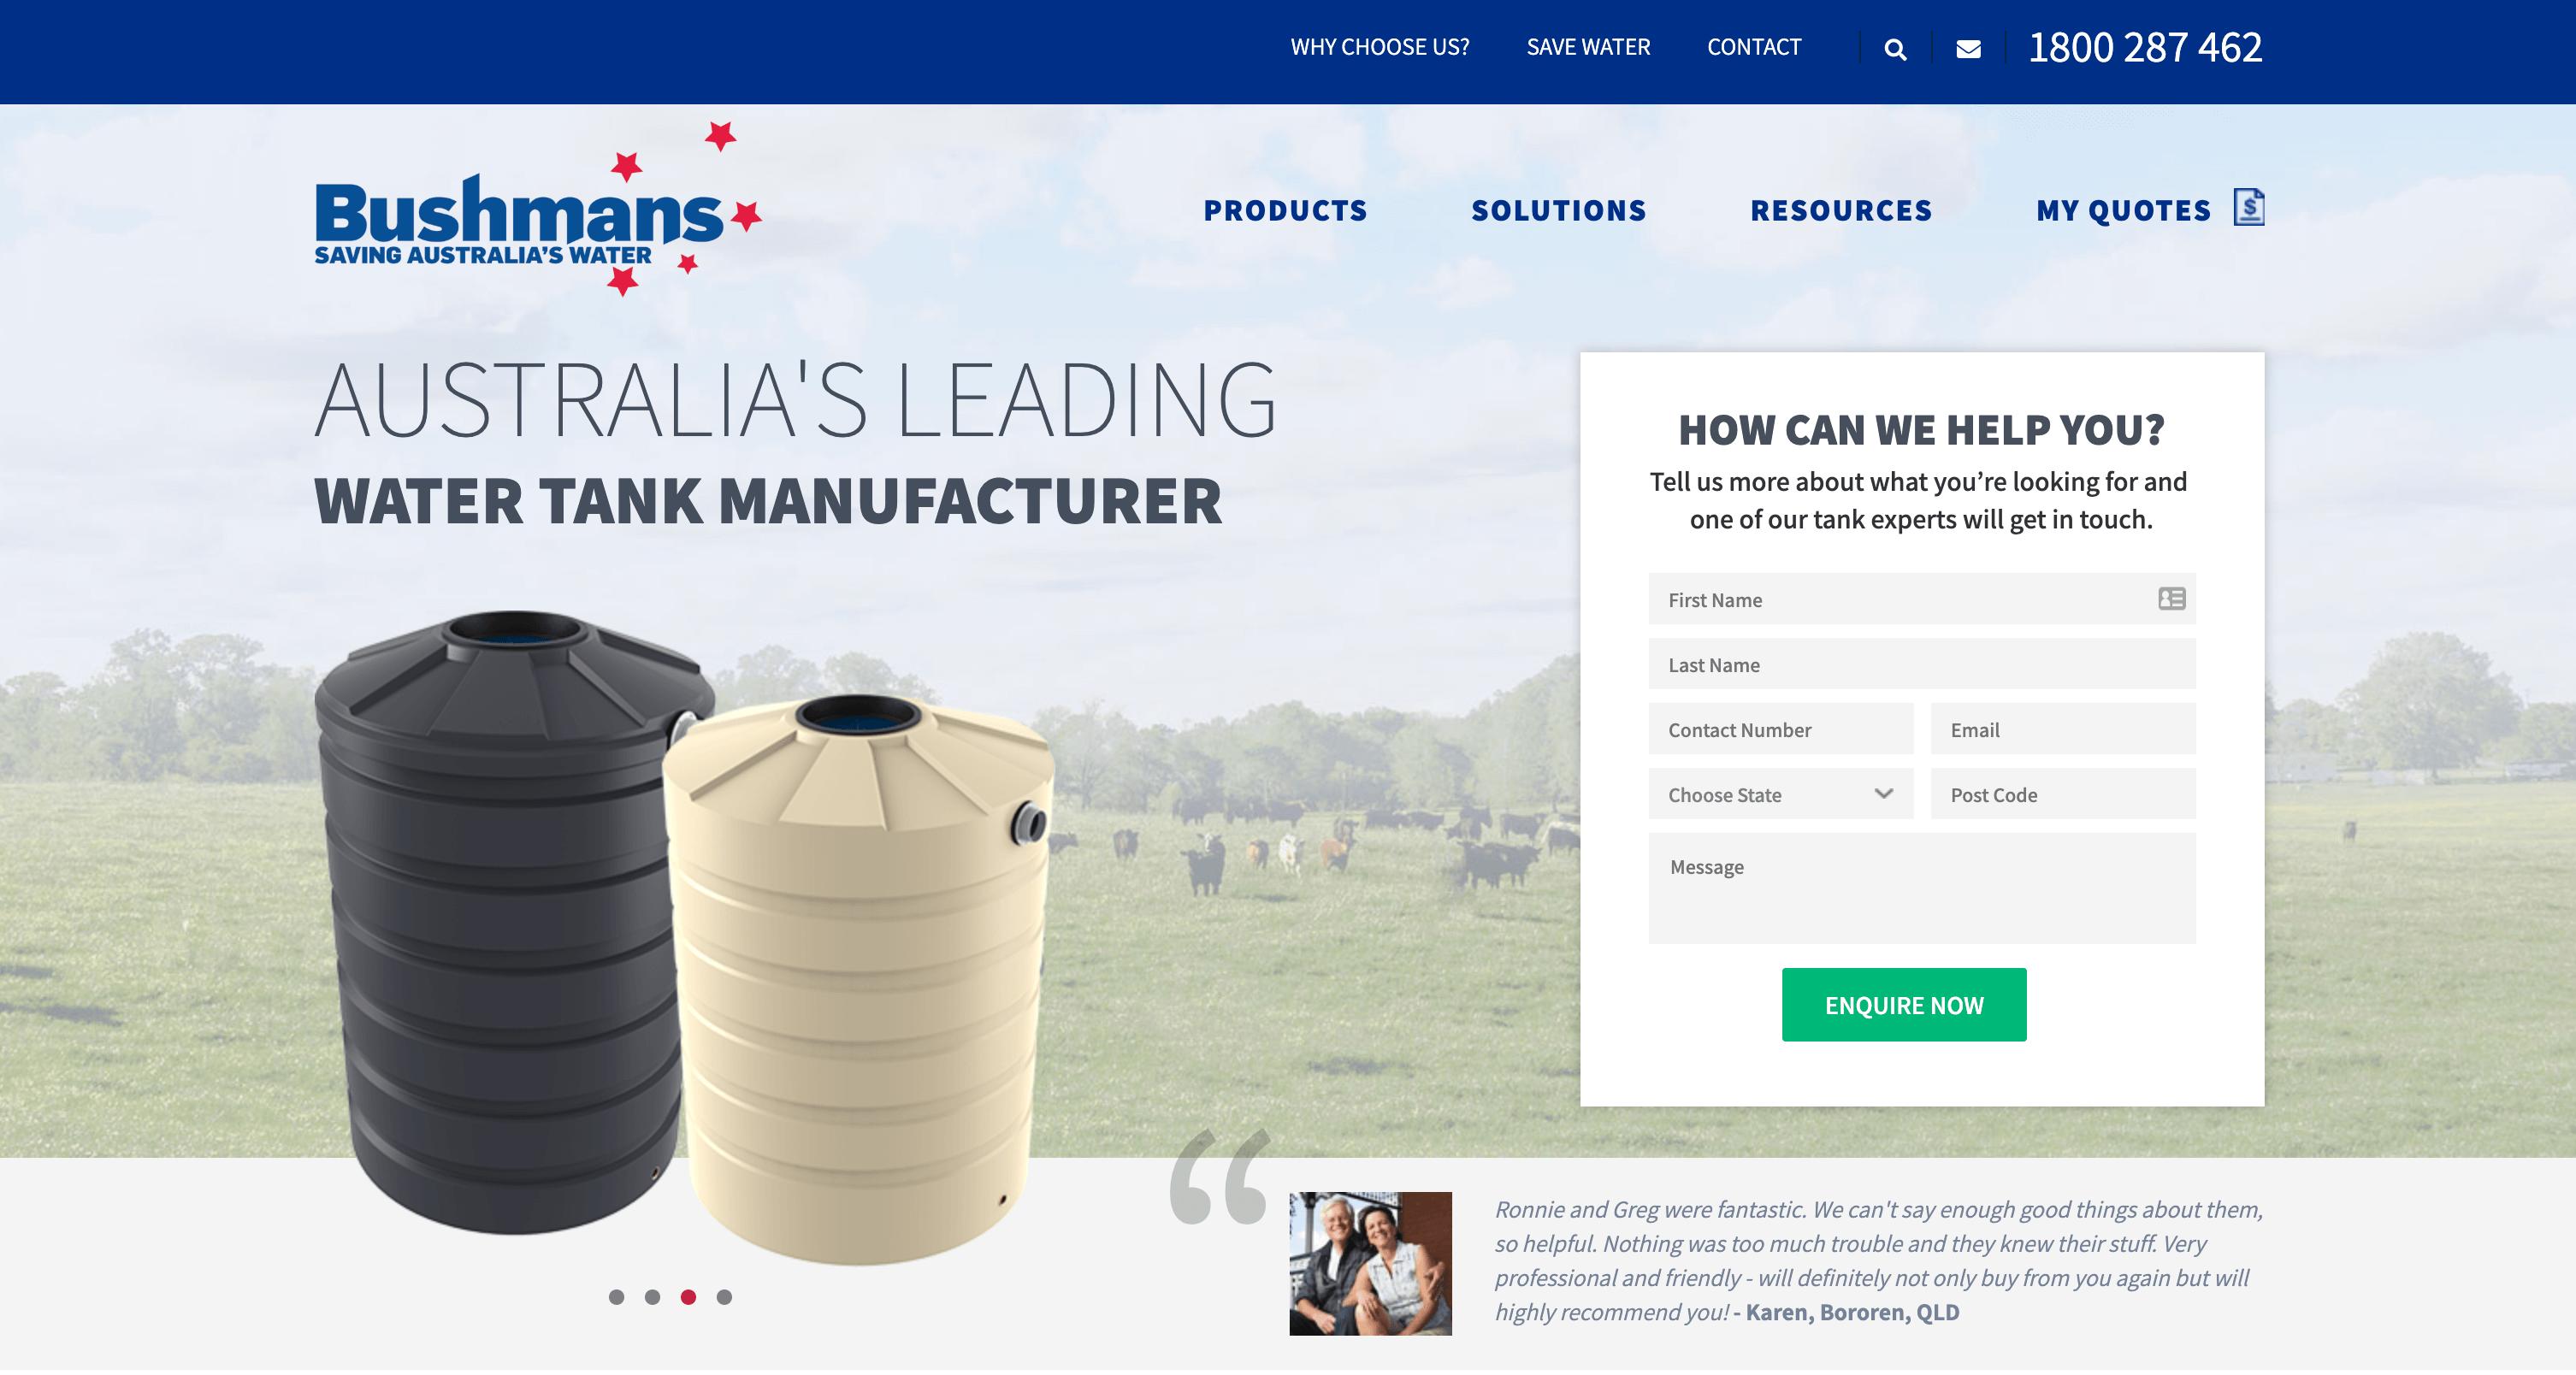 buhman tanks website screenshot (1)